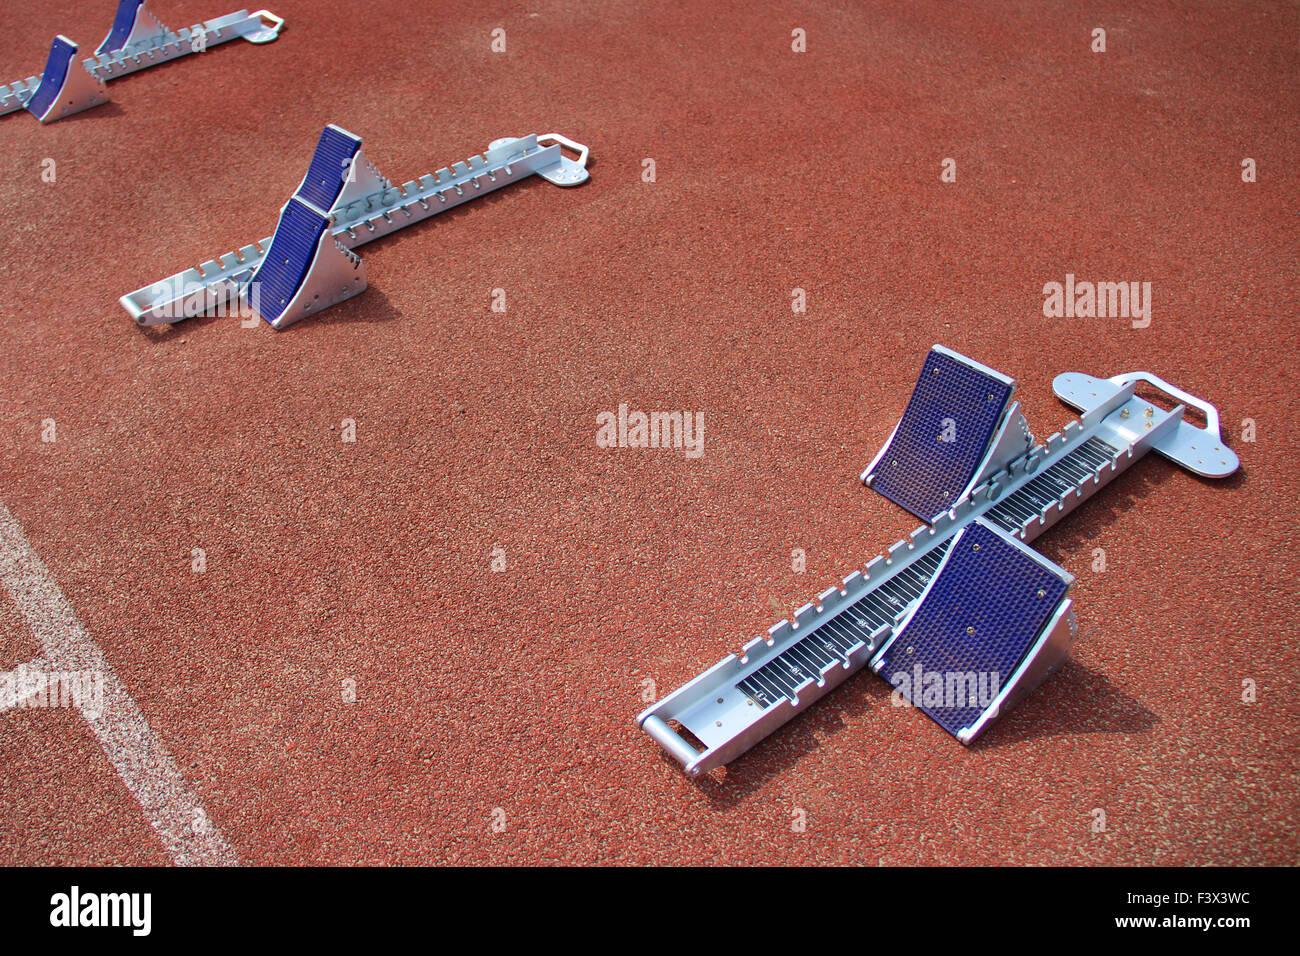 athletics starting blocks - Stock Image